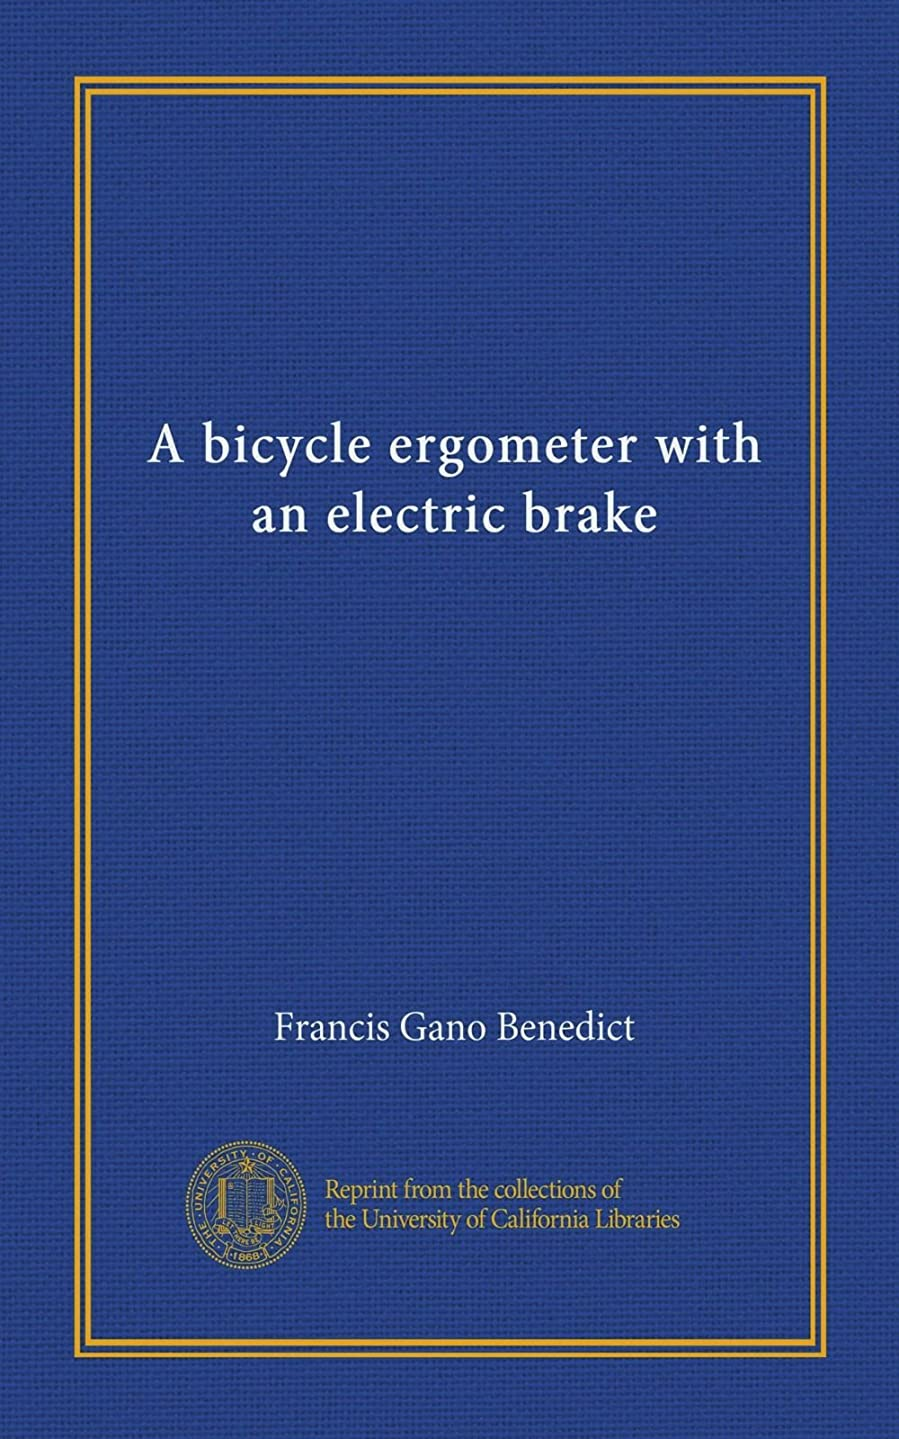 連邦聴衆減少A bicycle ergometer with an electric brake